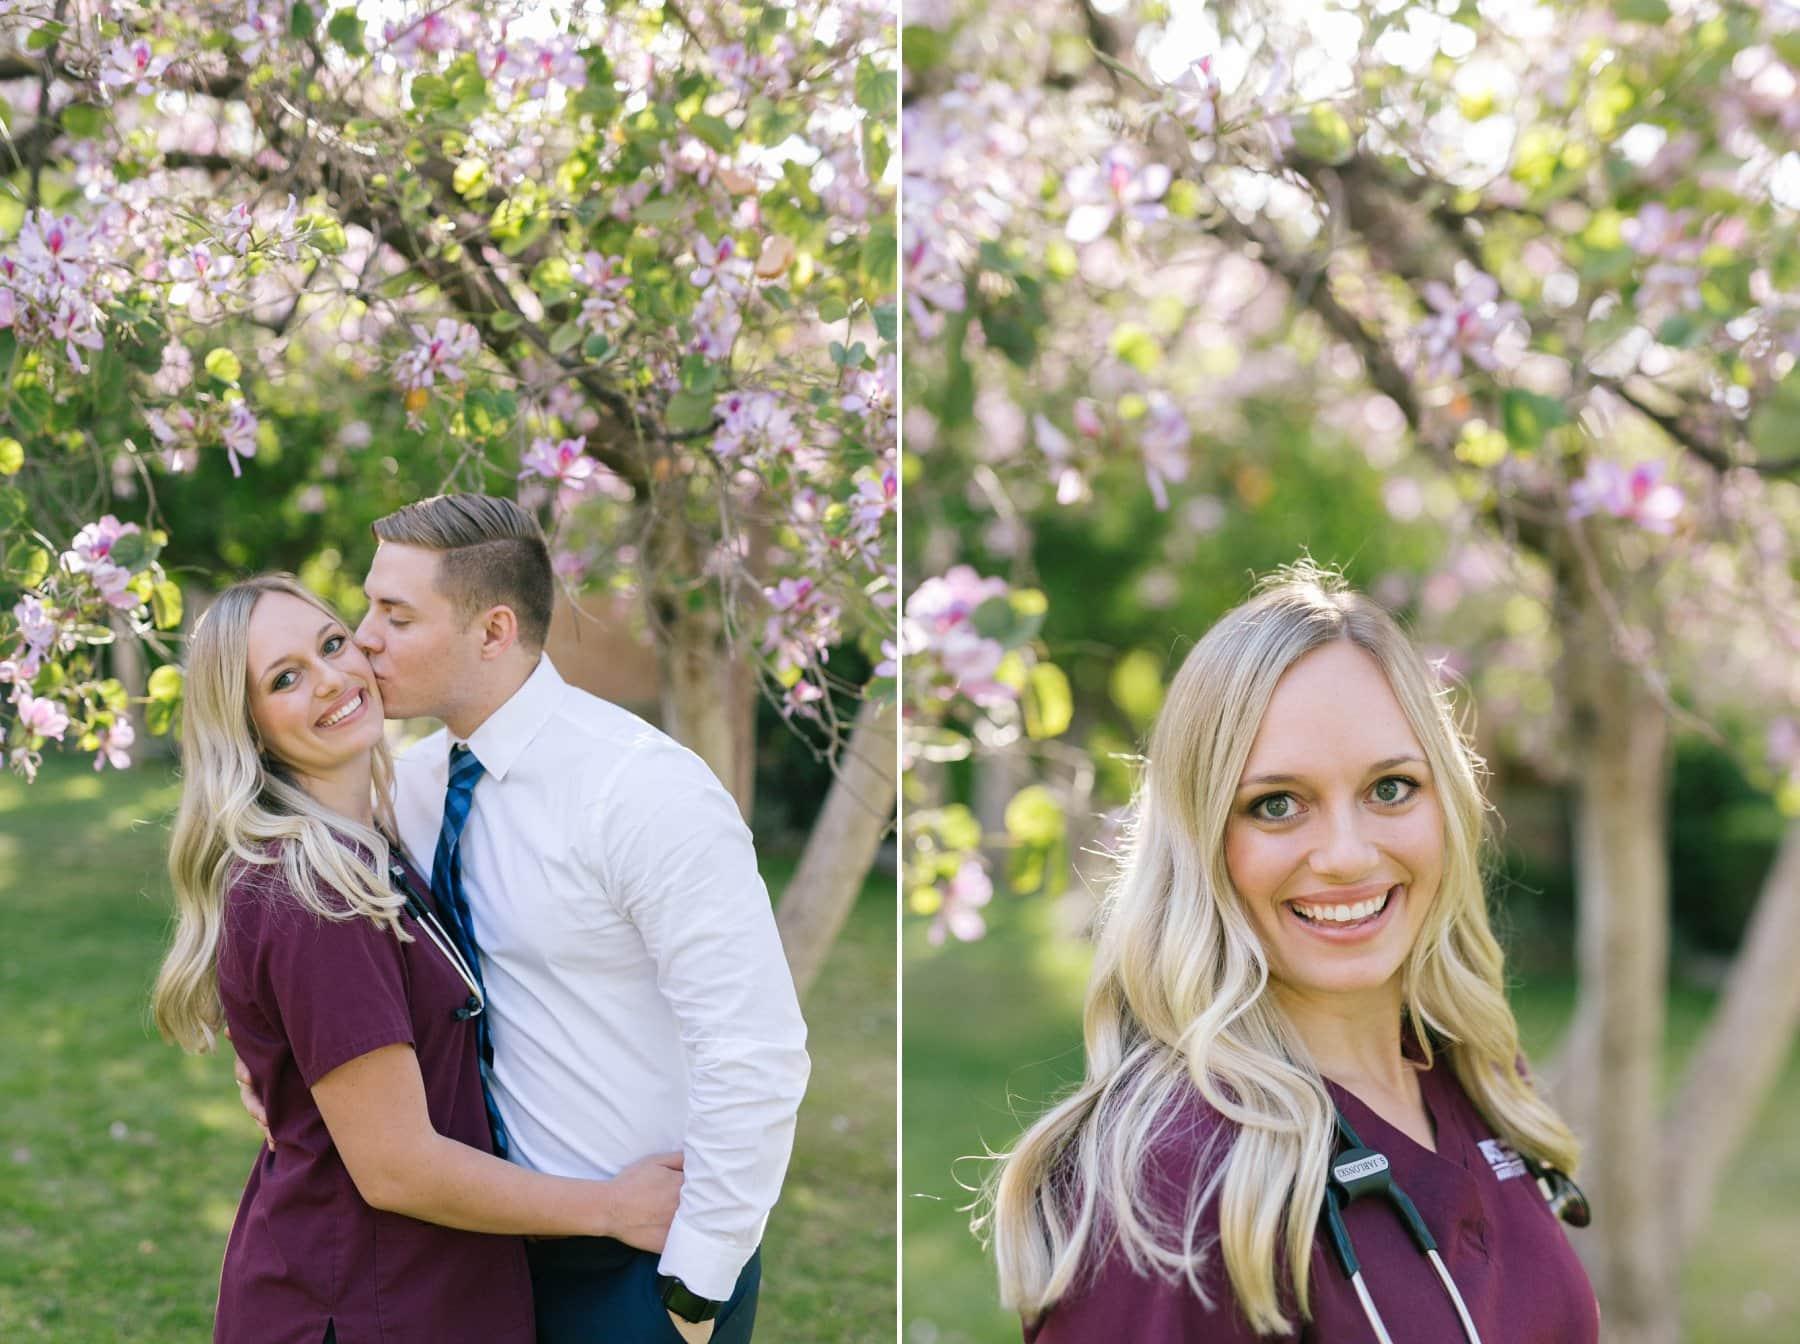 ASU nurse graduate engagement photos